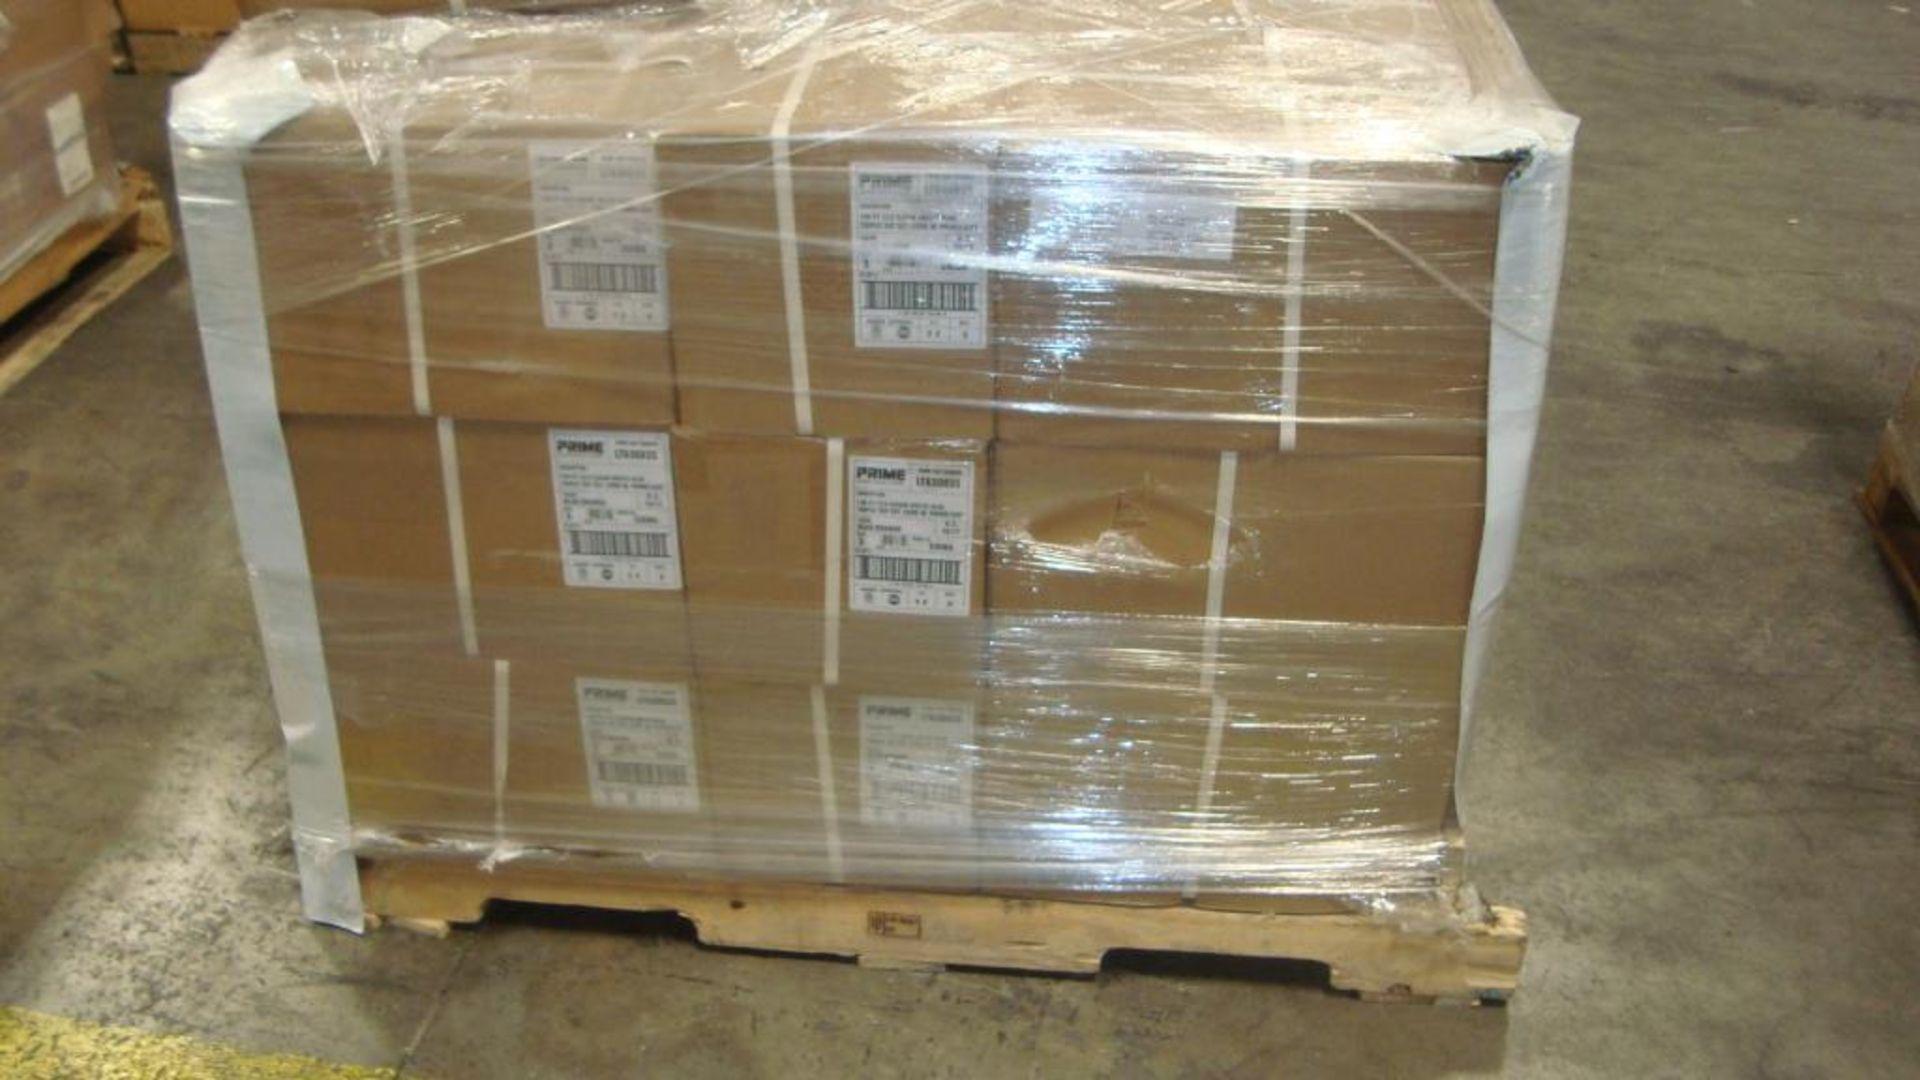 Extension Cords. Lot: 90 Total (30 Boxes - 3 ea.) Prime Wire & Cable pn# LT630835 Arctic Blue 100 - Image 8 of 9